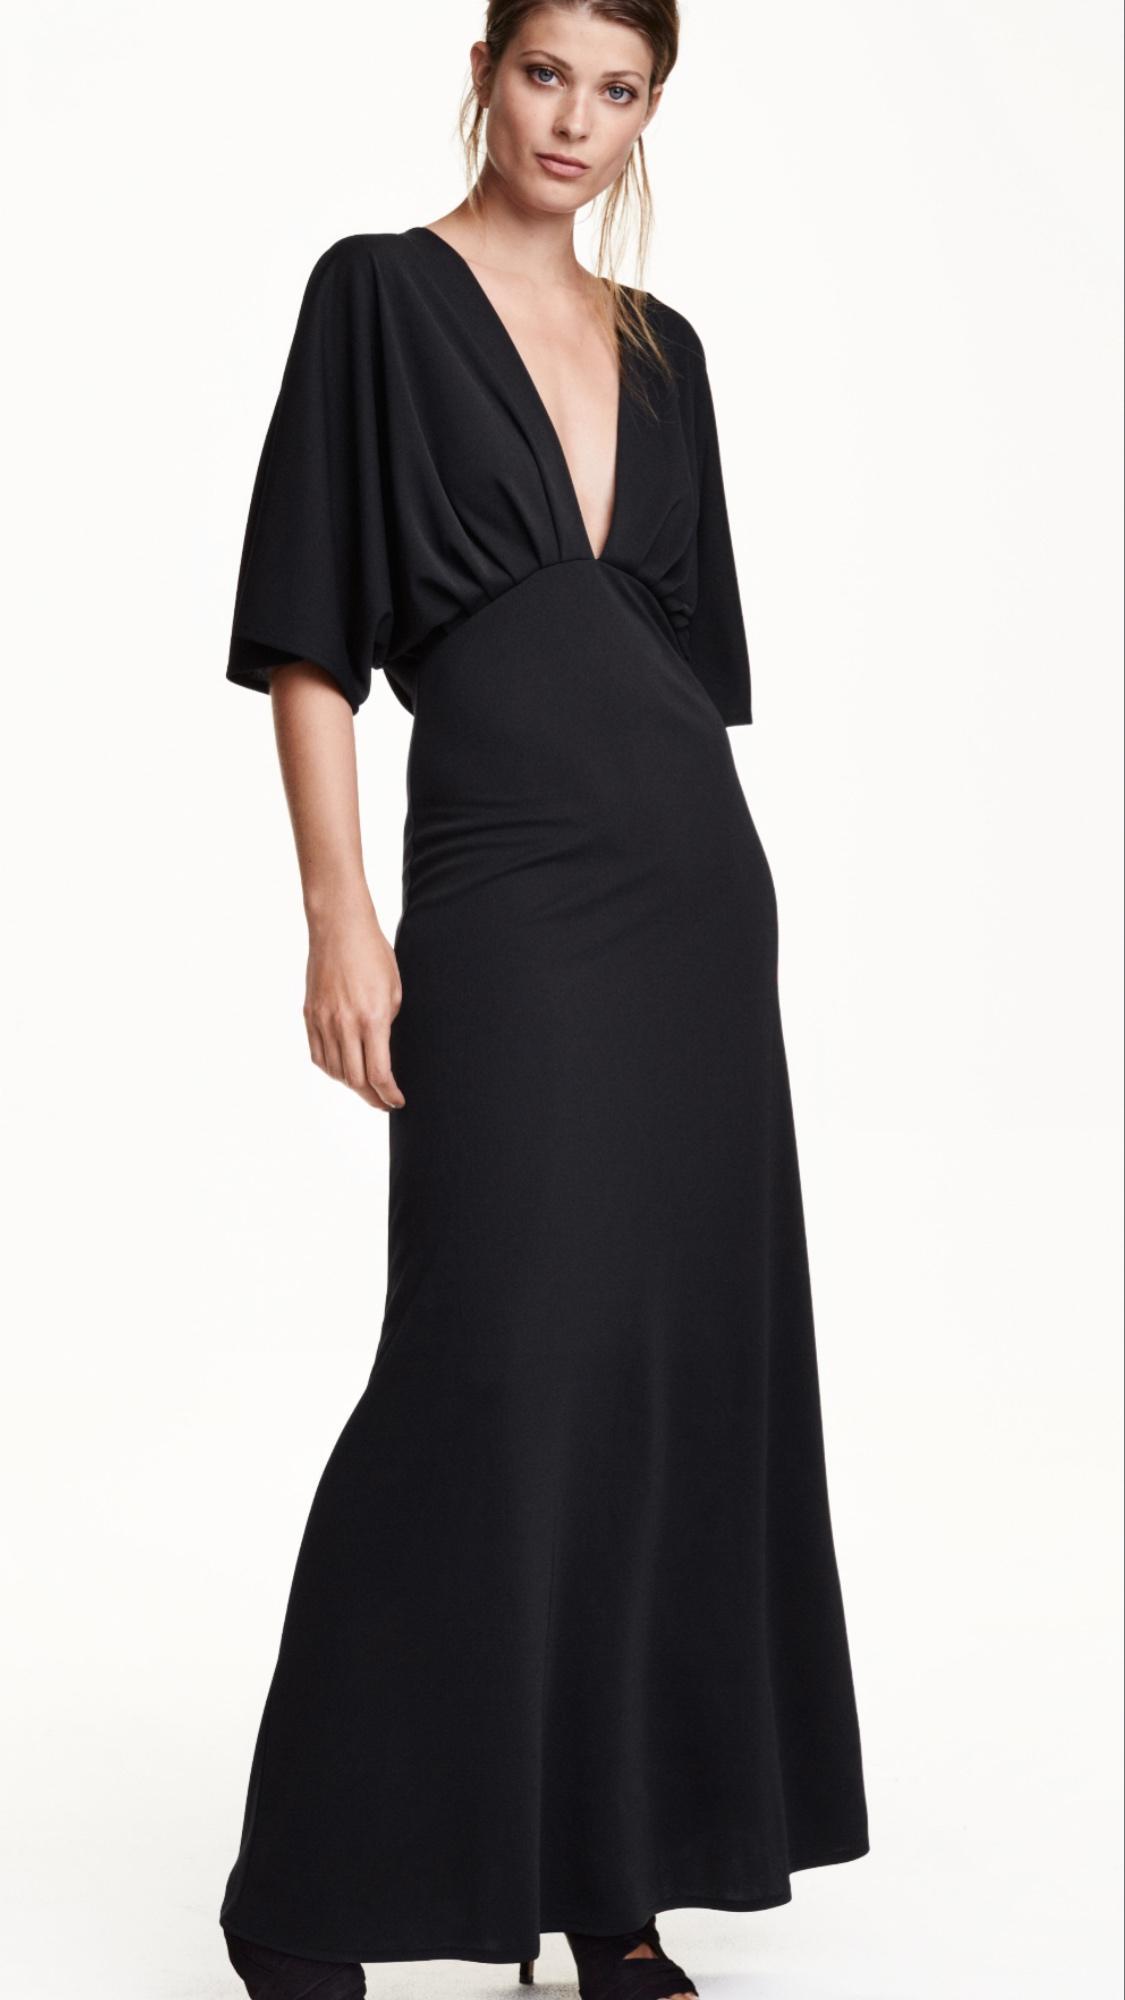 Robe h&m noir